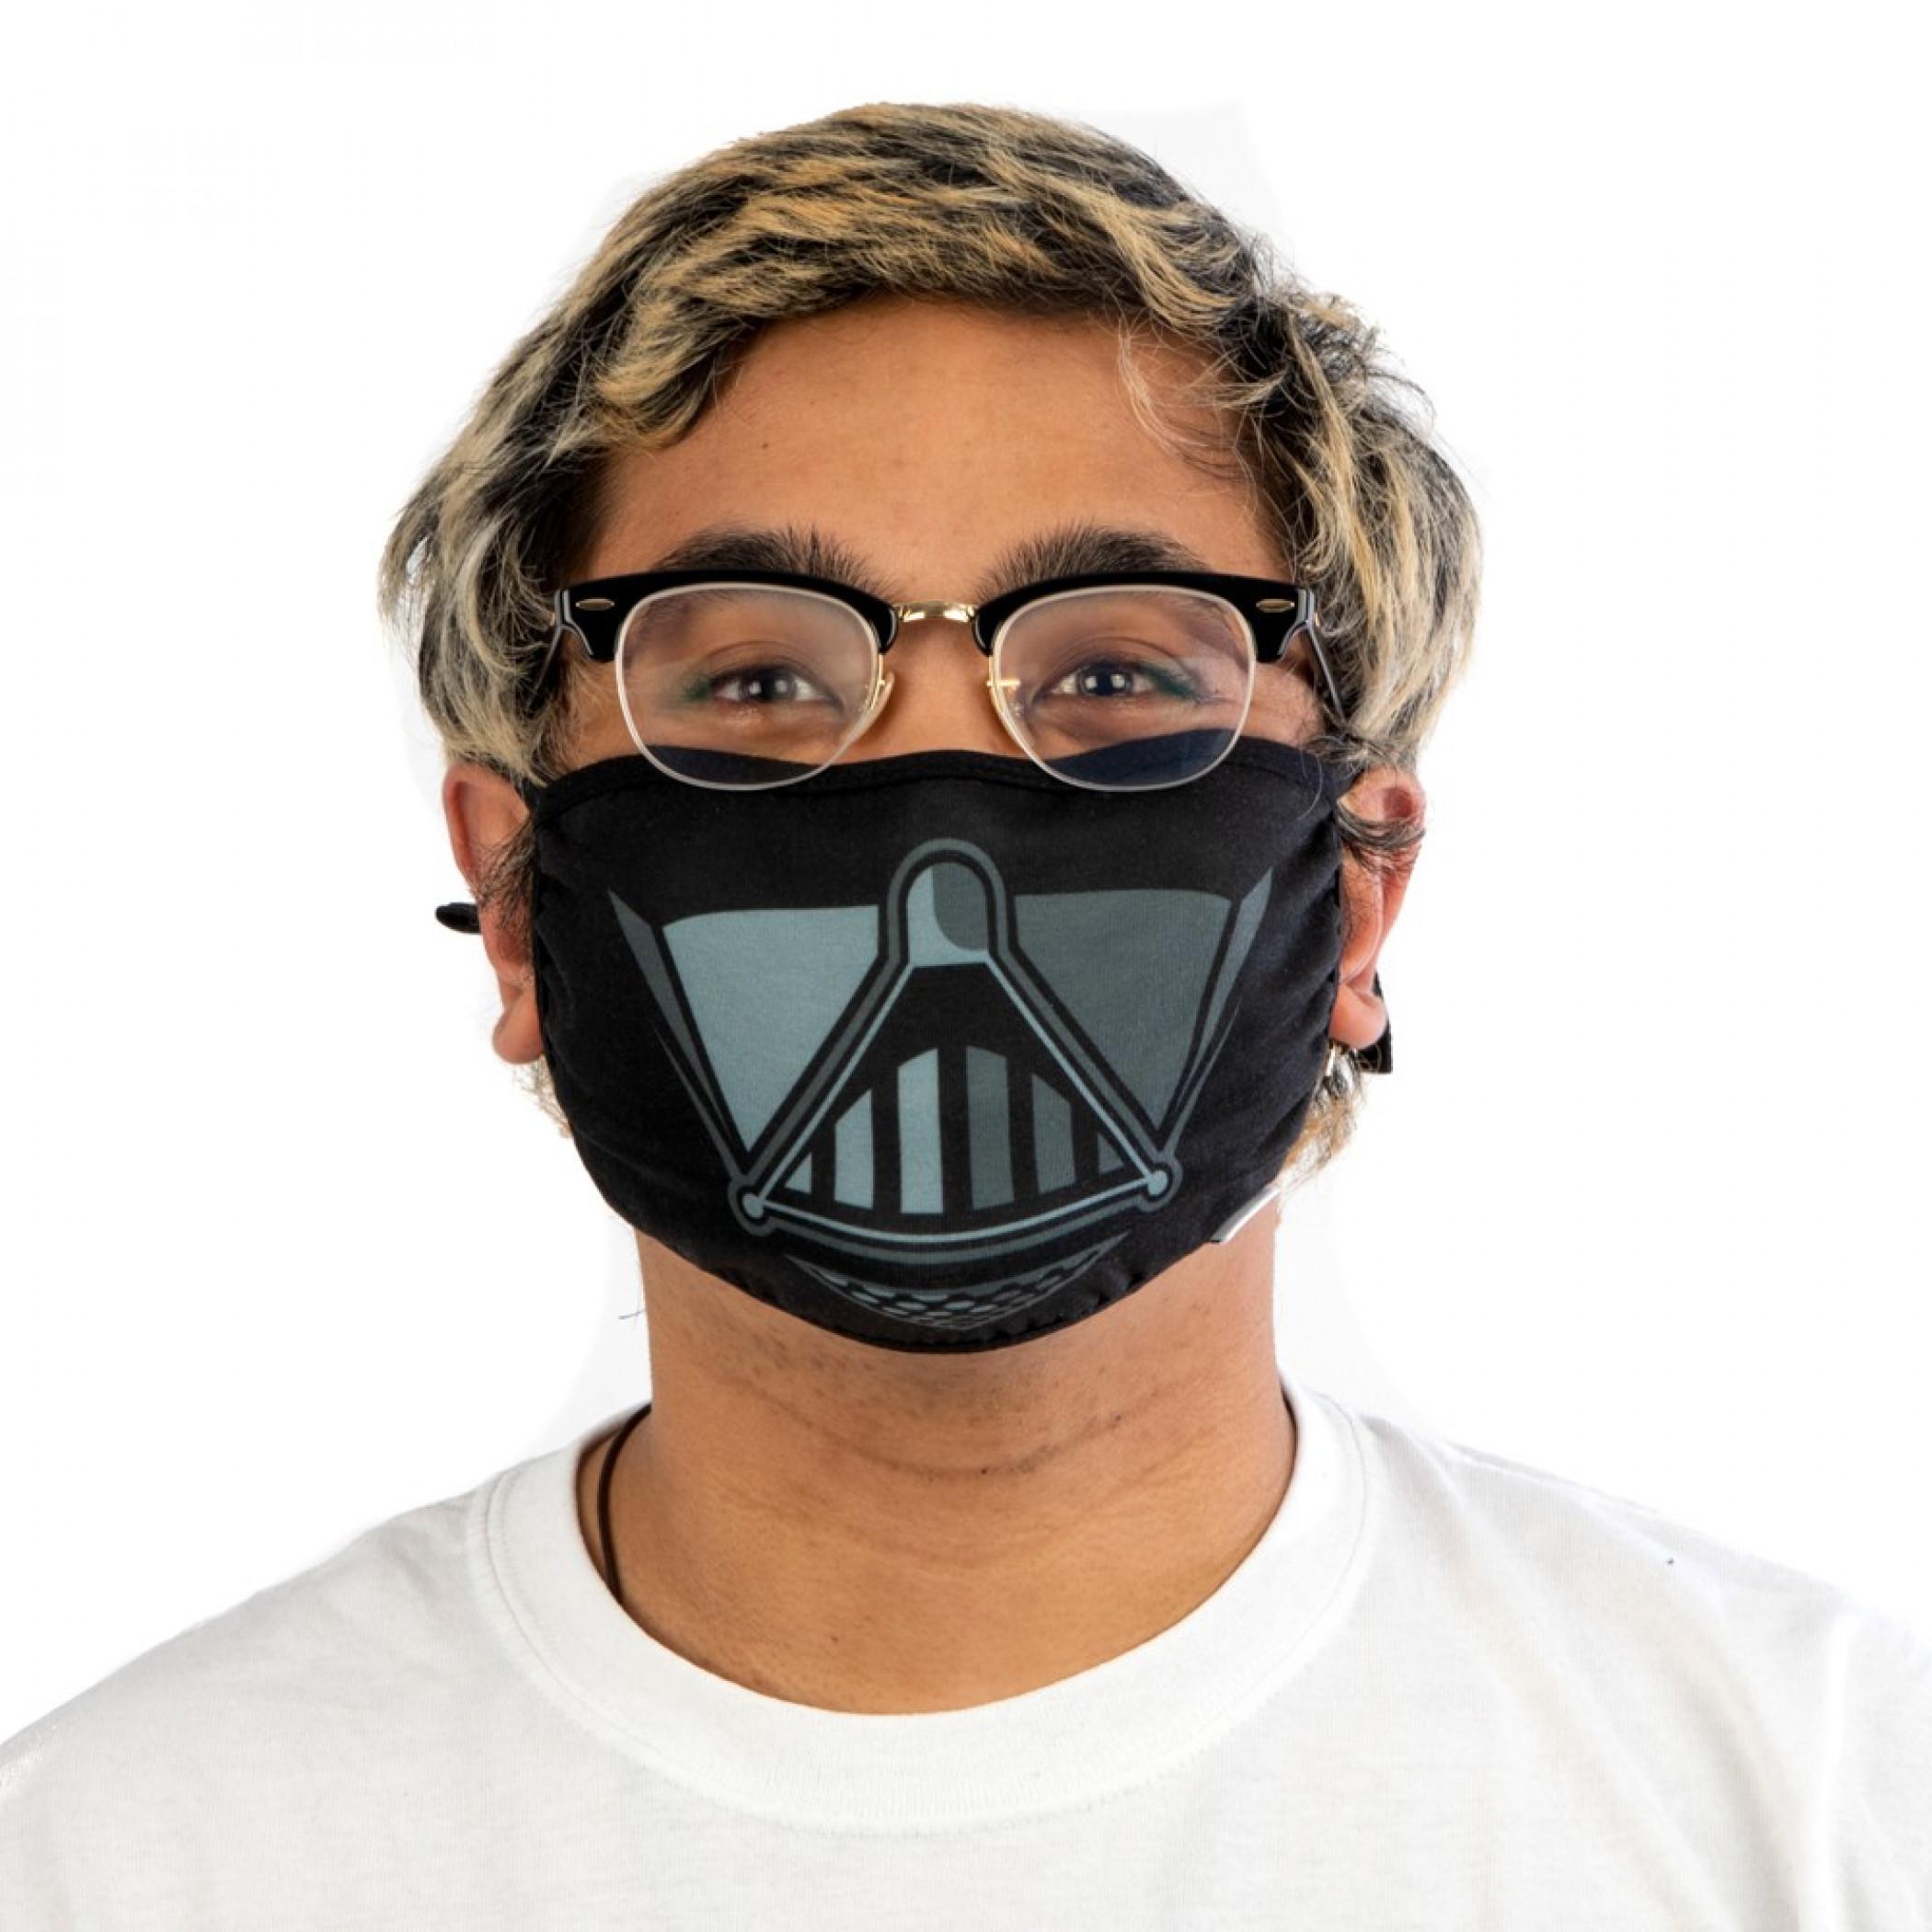 Star Wars Darth Vader Adjustable Face Cover